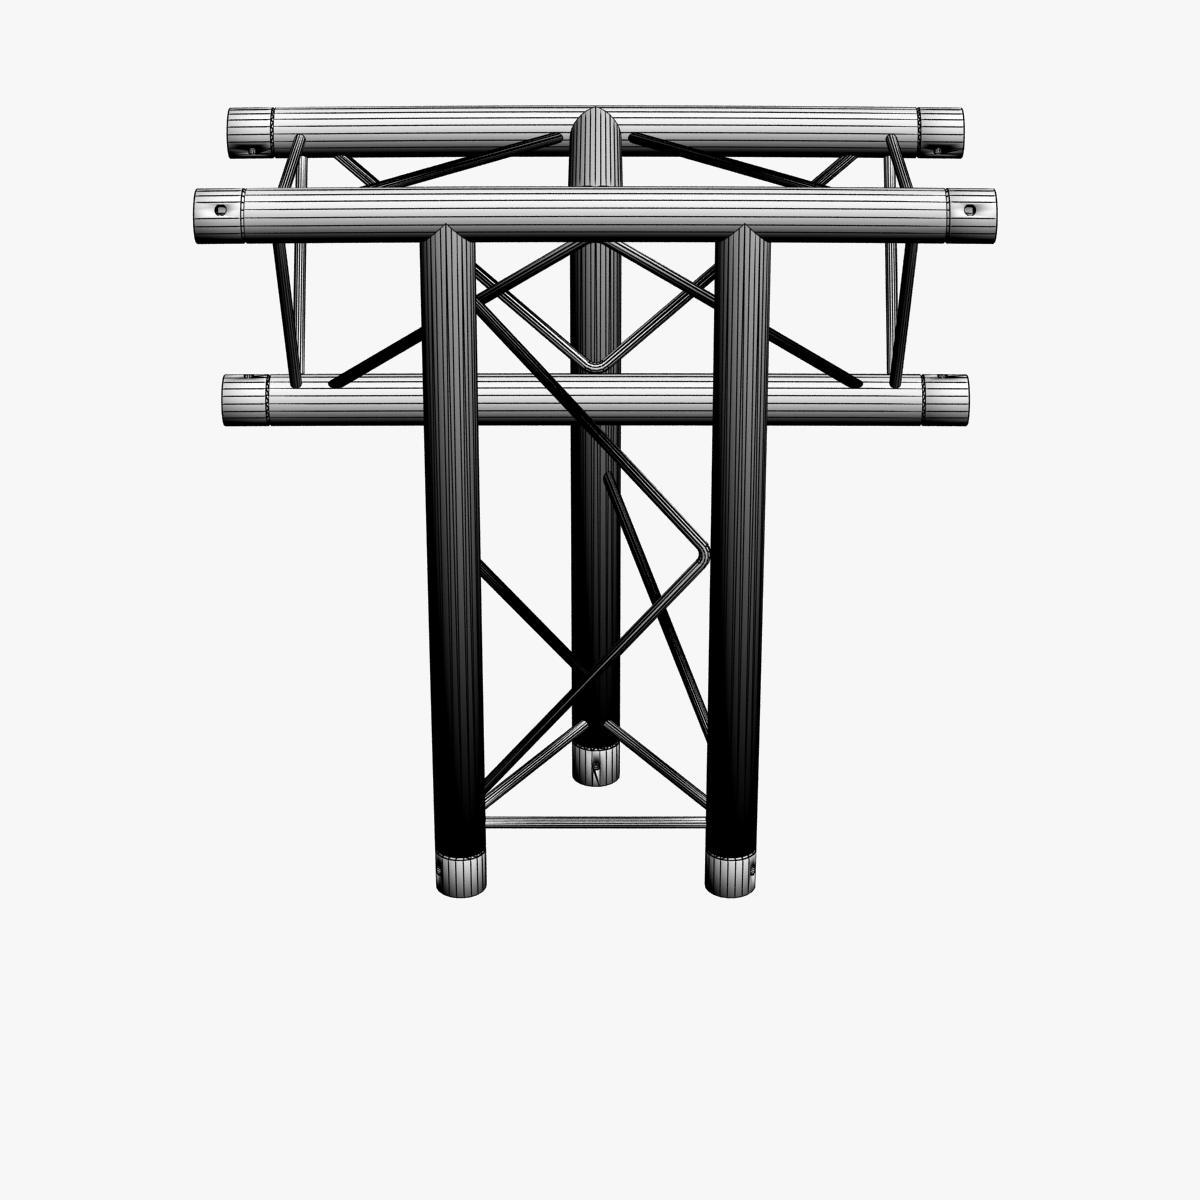 triangular trusses (collection 55 modular pieces) 3d model 3ds max dxf fbx c4d dae texture obj 216262